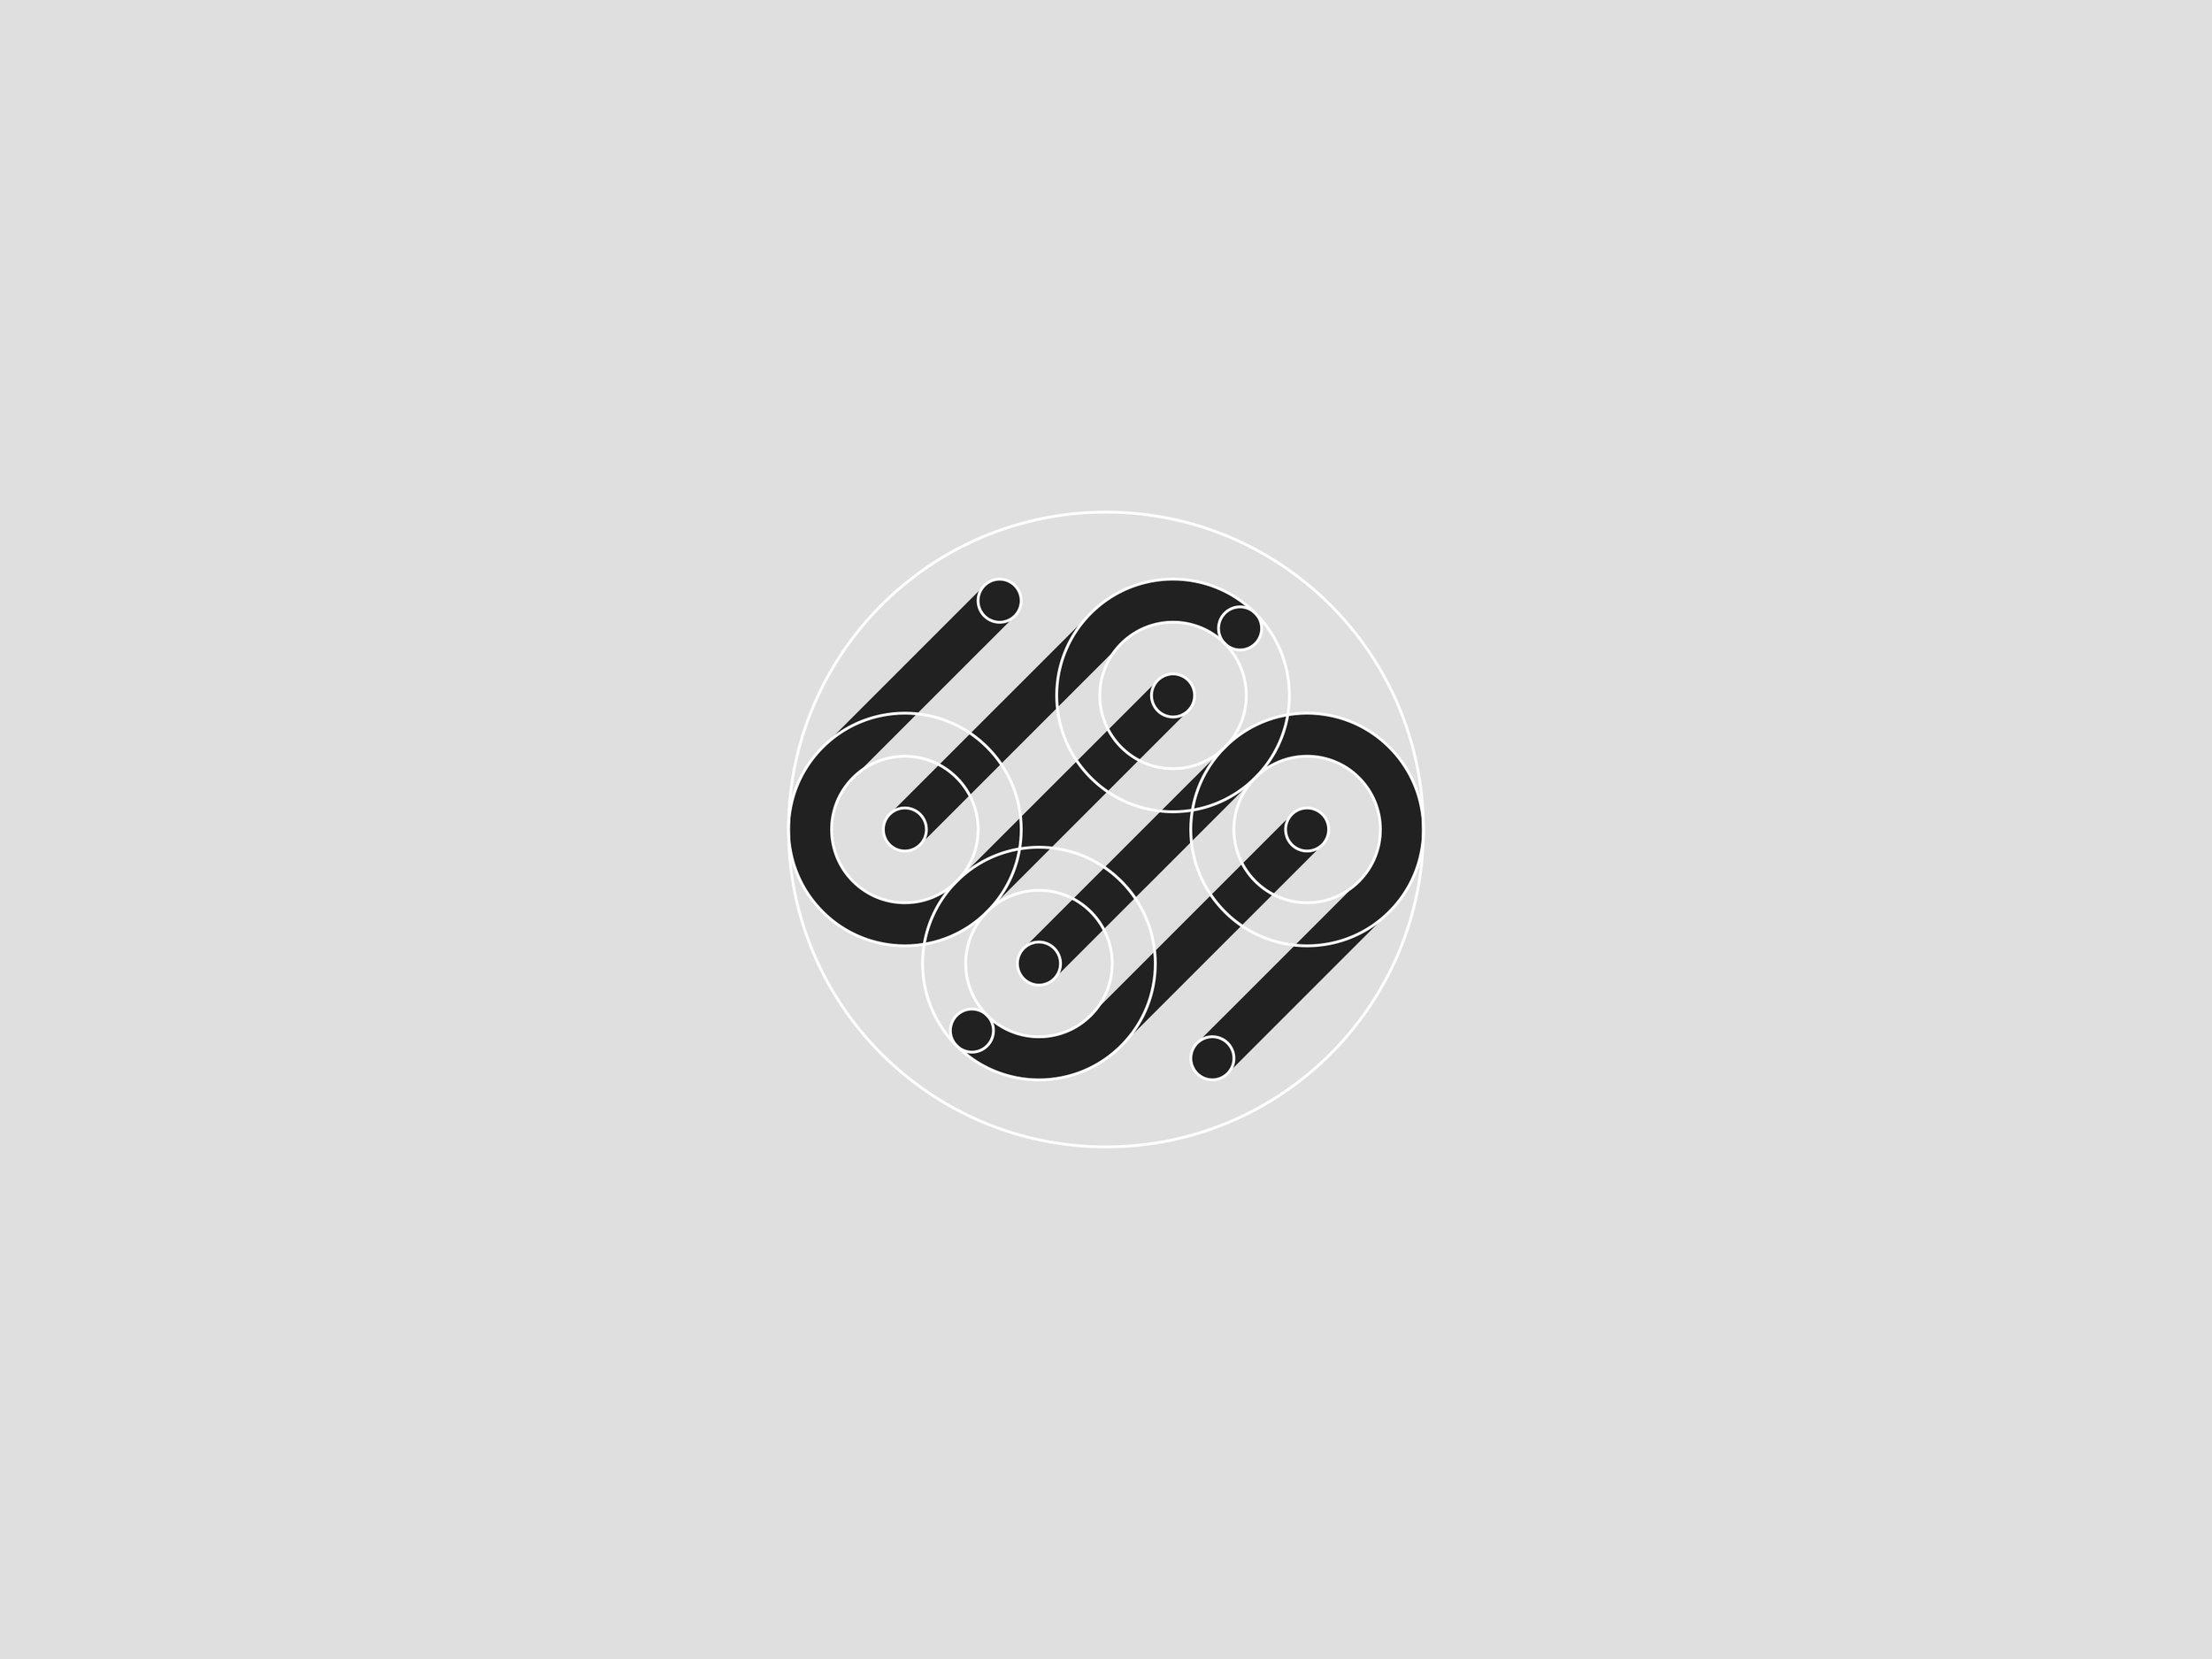 squarespace-logo-grid-grey.jpg